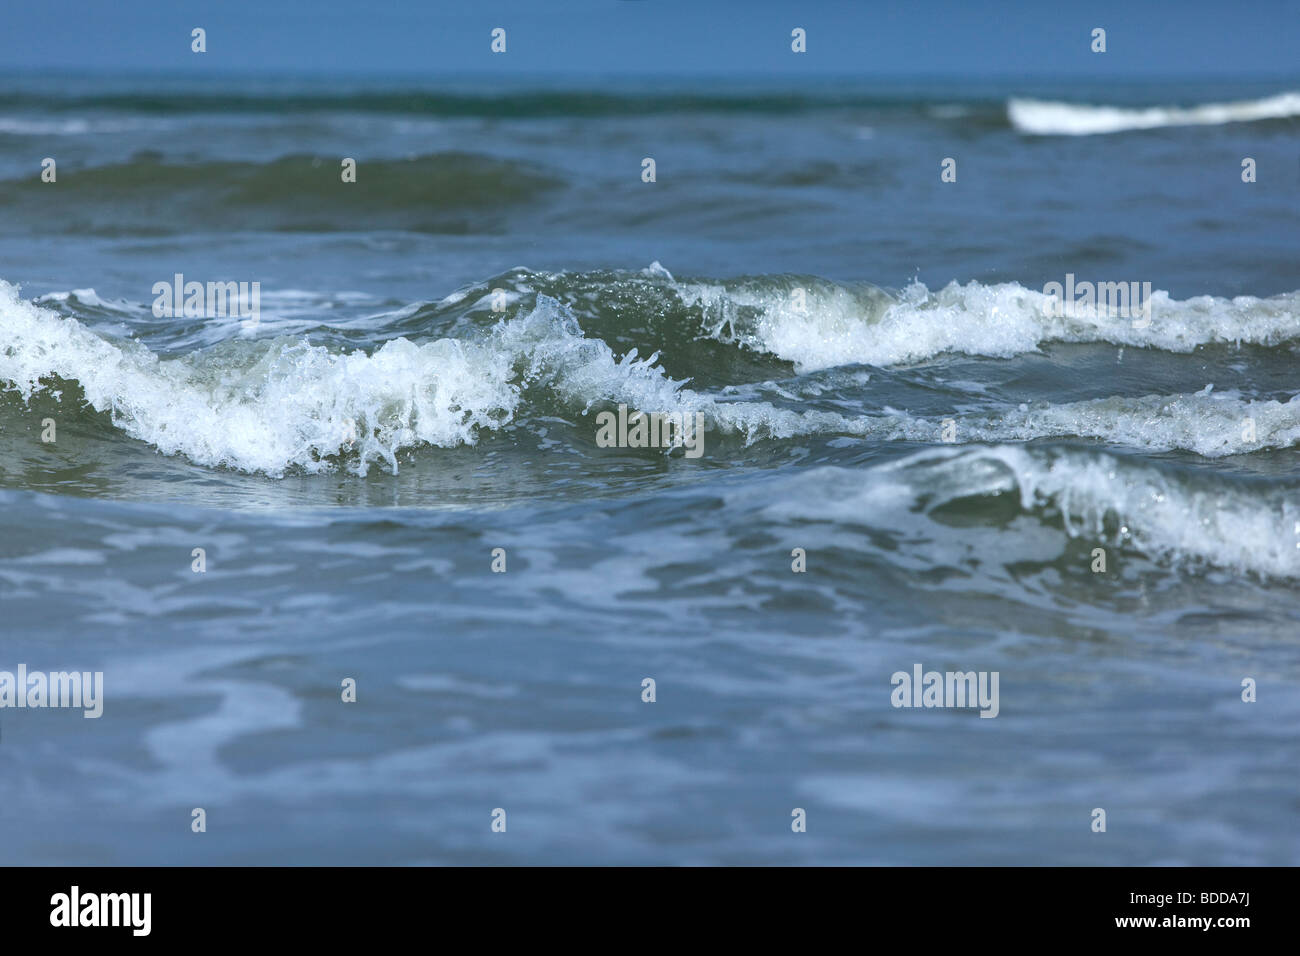 Sea waves - Stock Image